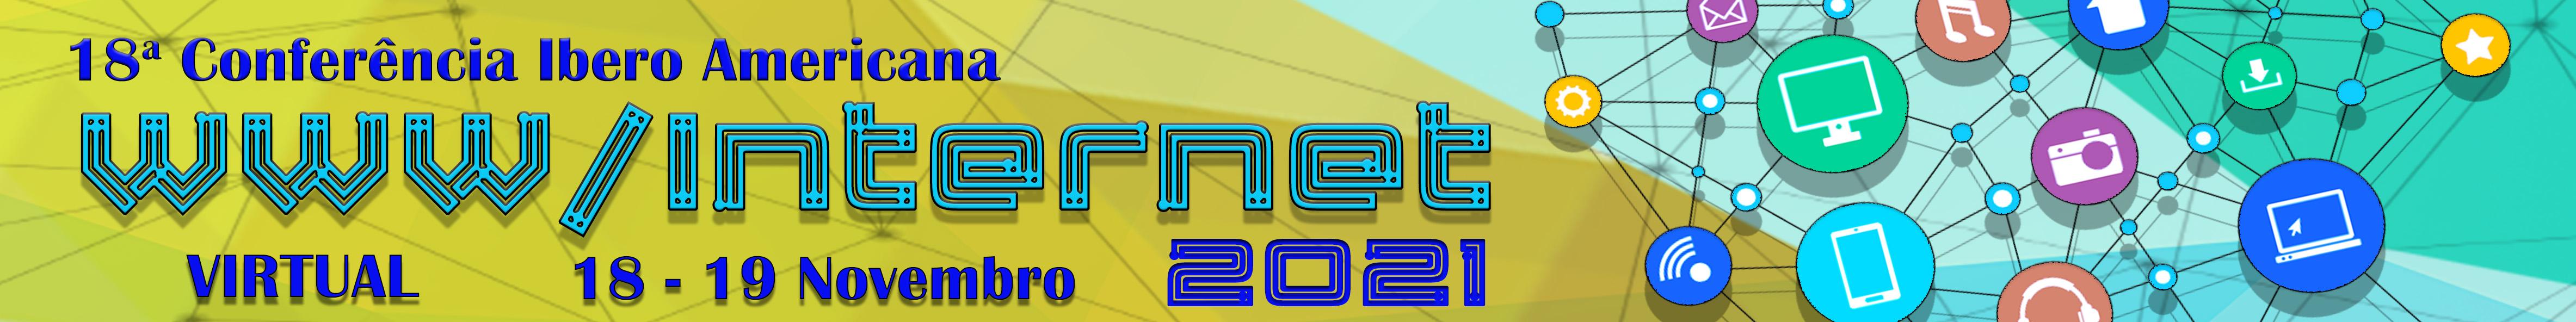 CIAWI 2021 PT